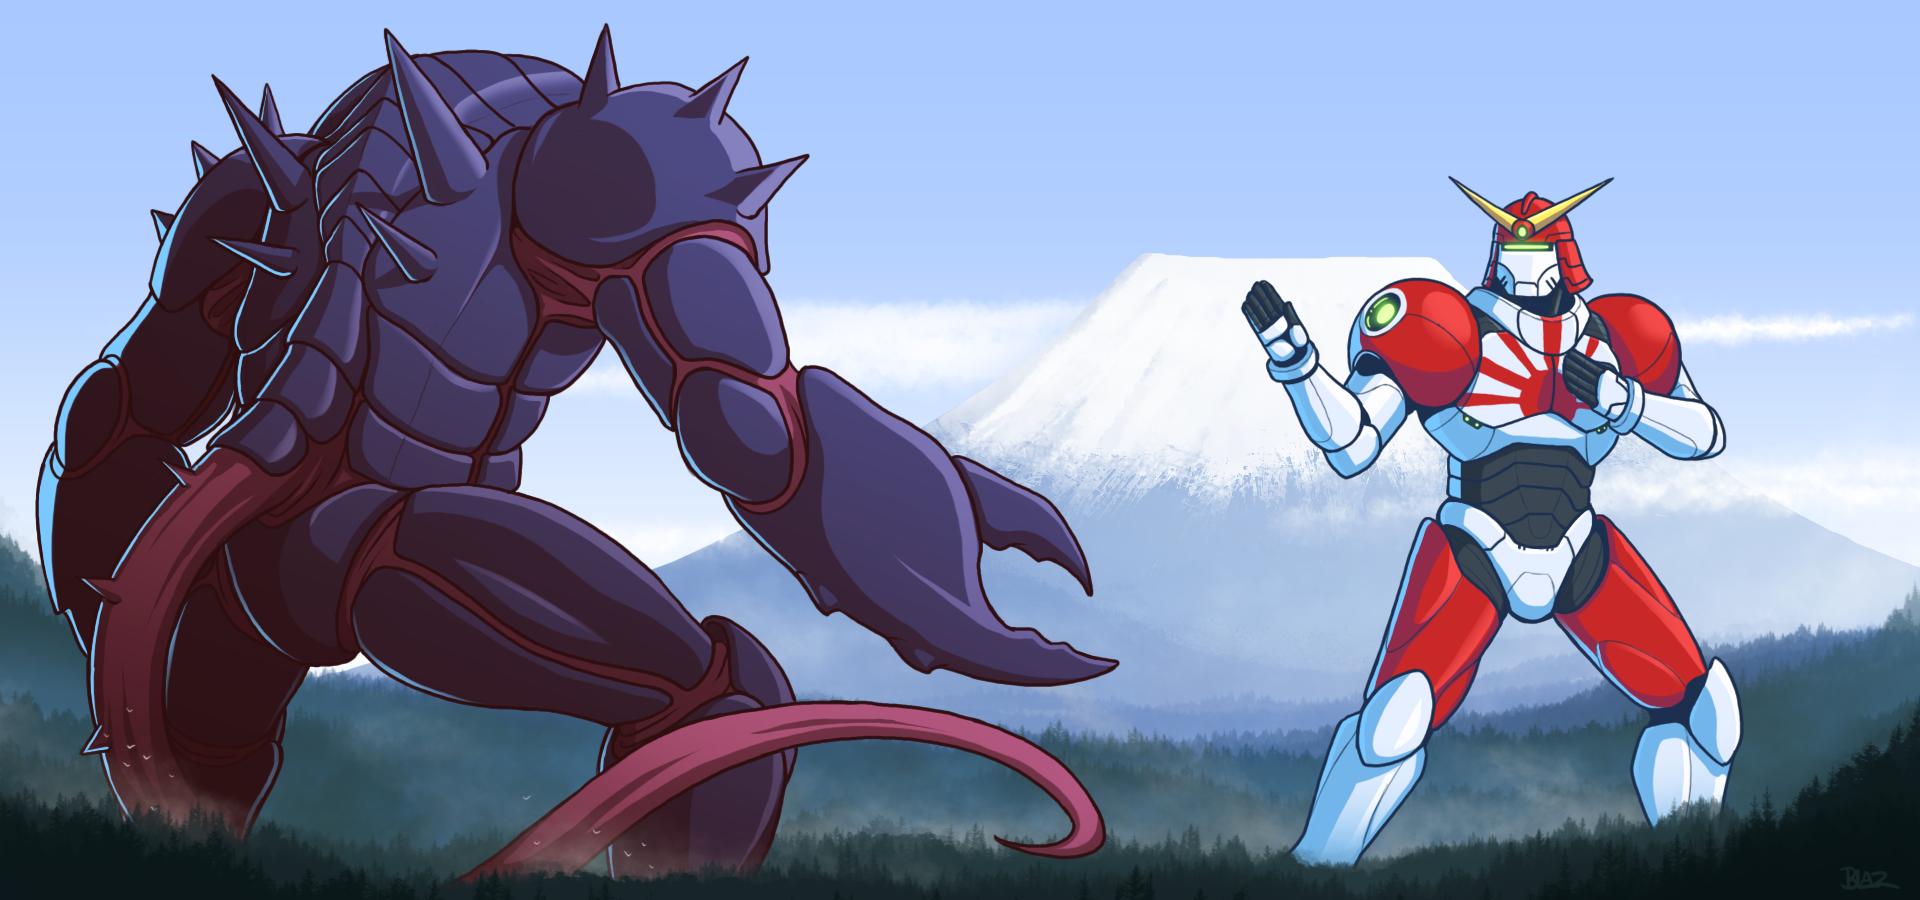 Karkrabadon vs Samurai Swagger by Blazbaros on DeviantArt